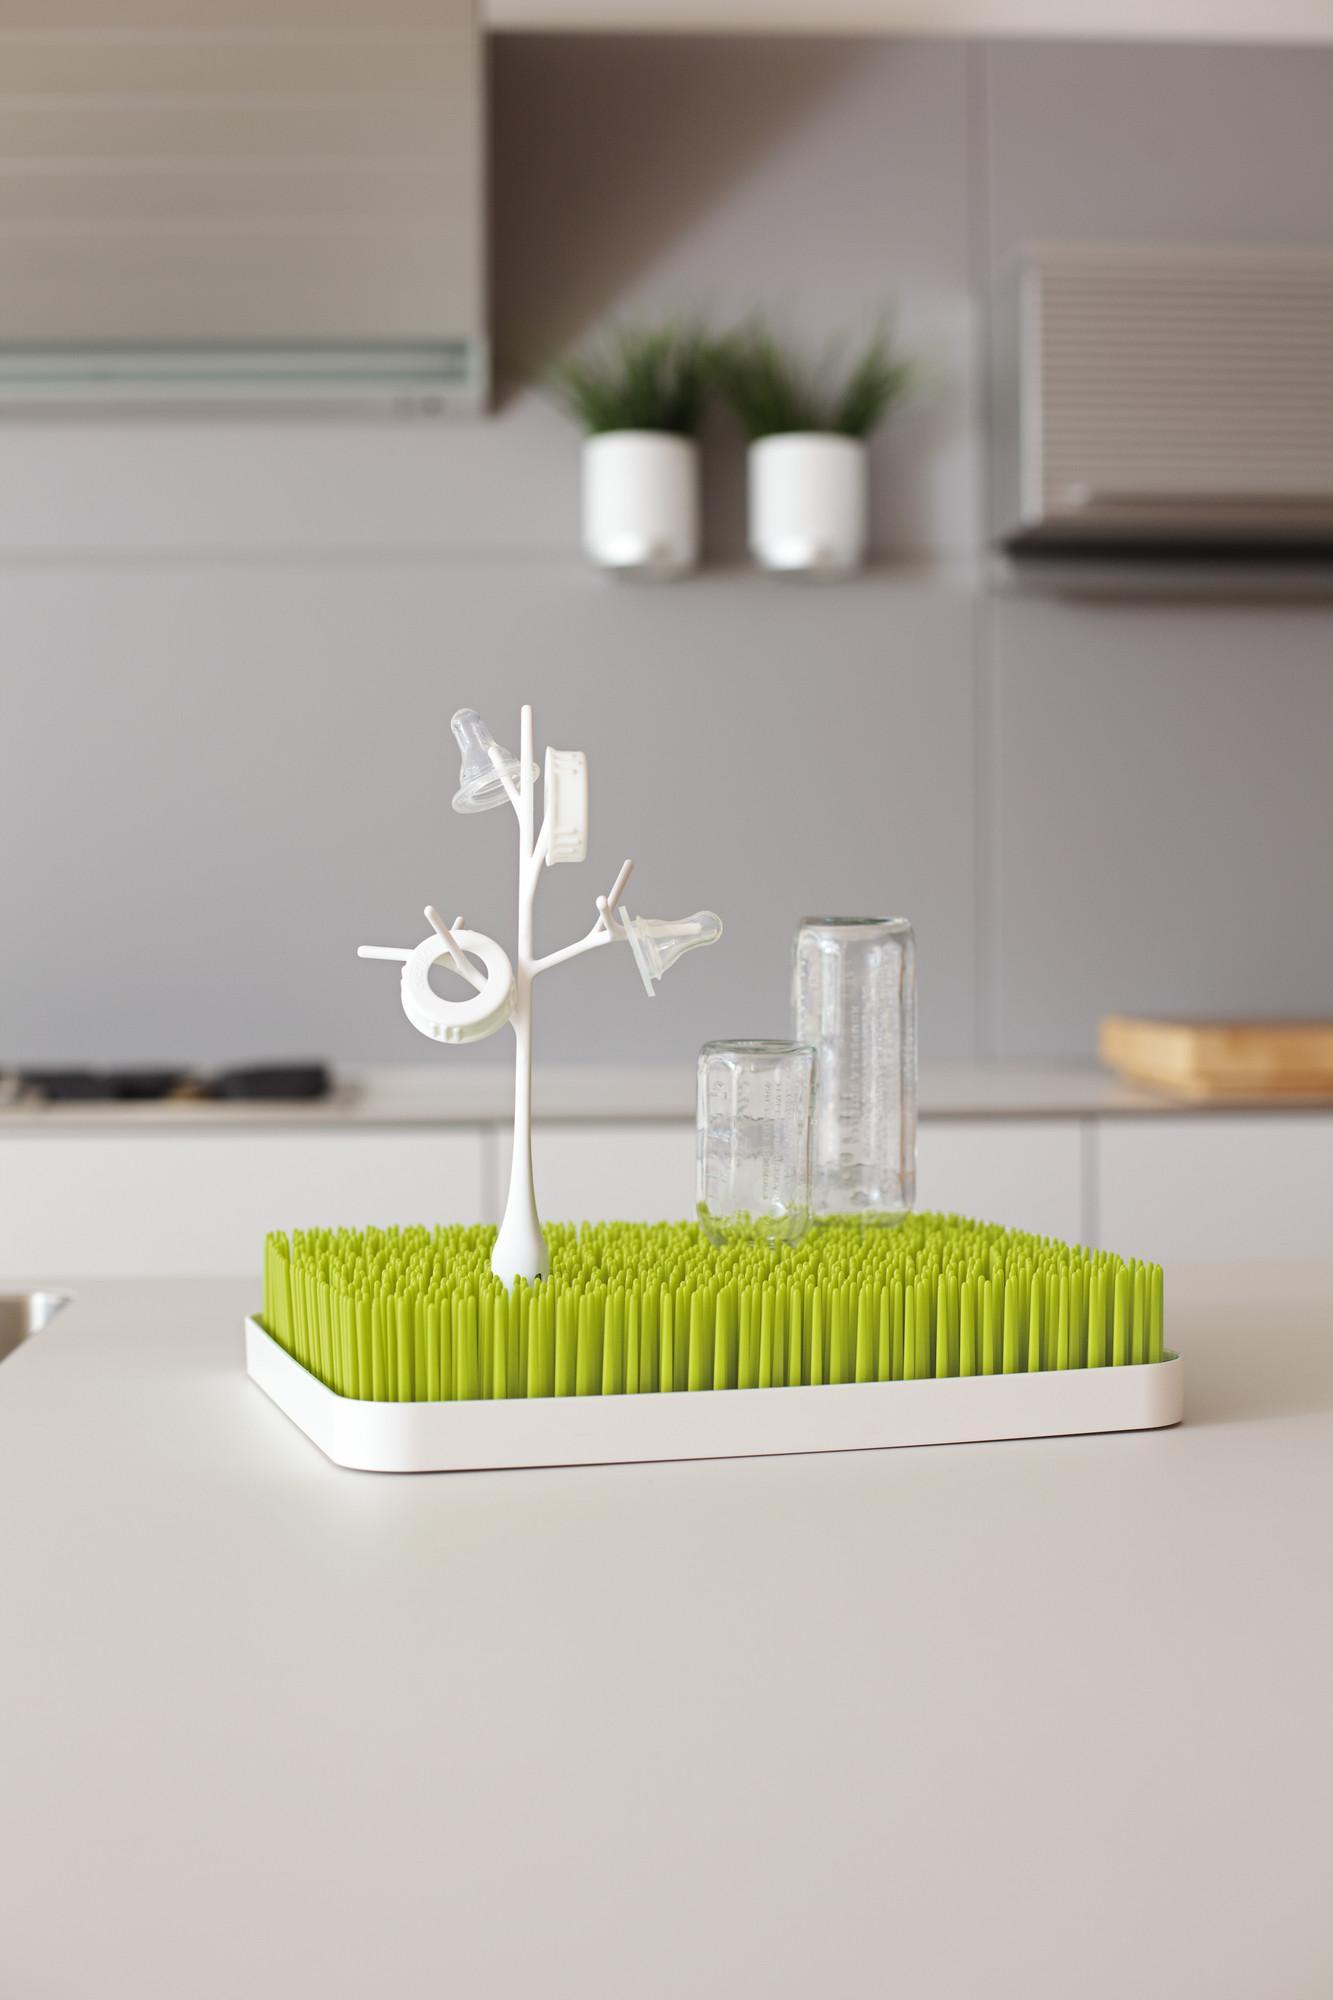 Amazon.com : Boon Lawn Countertop Drying Rack Green : Baby Bottle